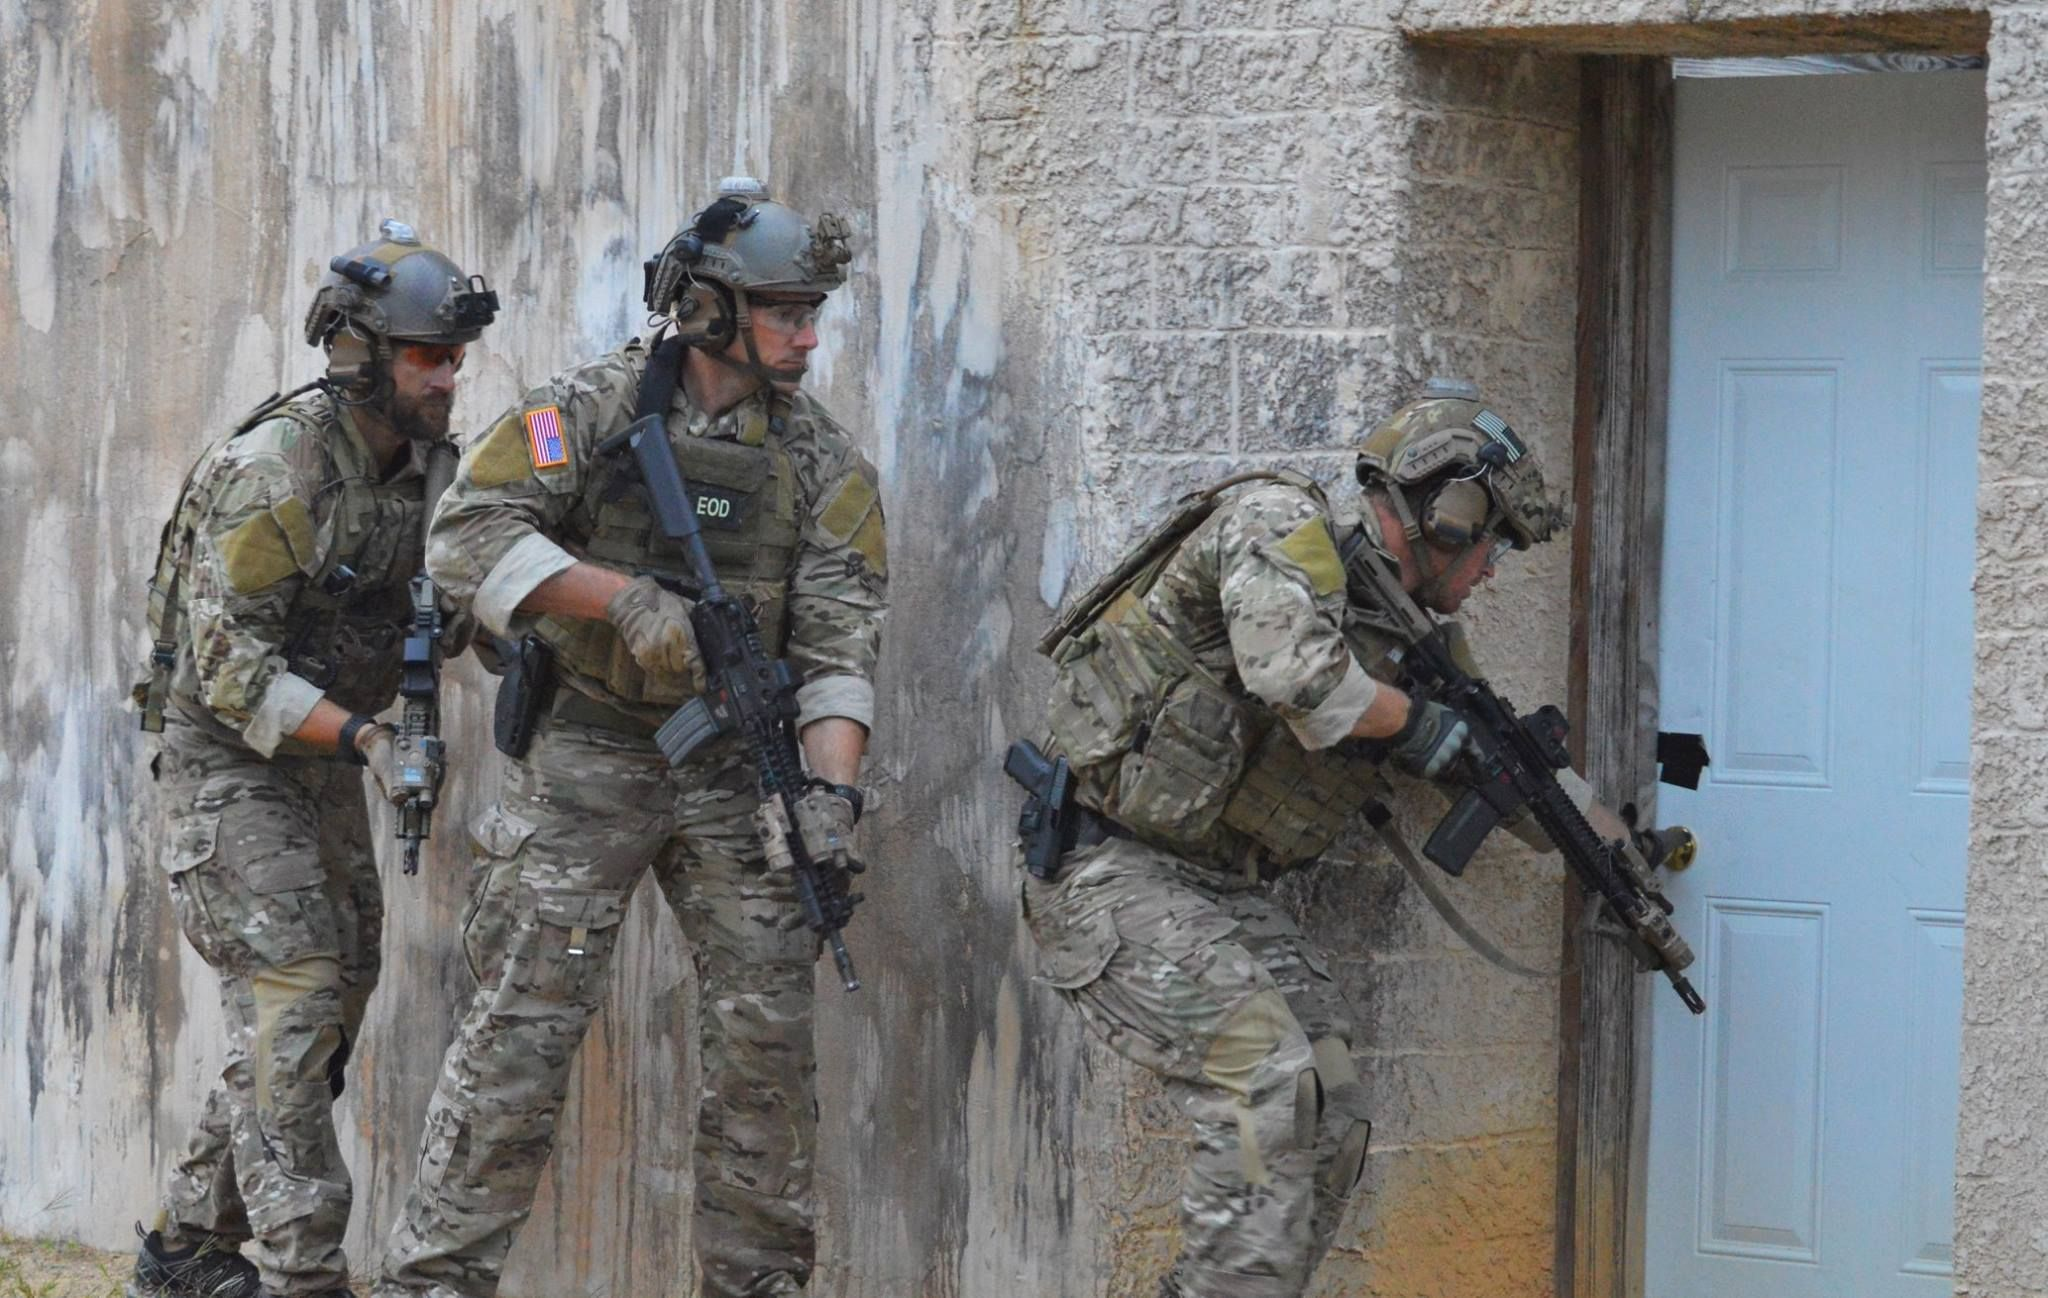 US Army EOD Techs prepare to breach a door September 2015 America [2048x1298] & US Army EOD Techs prepare to breach a door September 2015 America ...